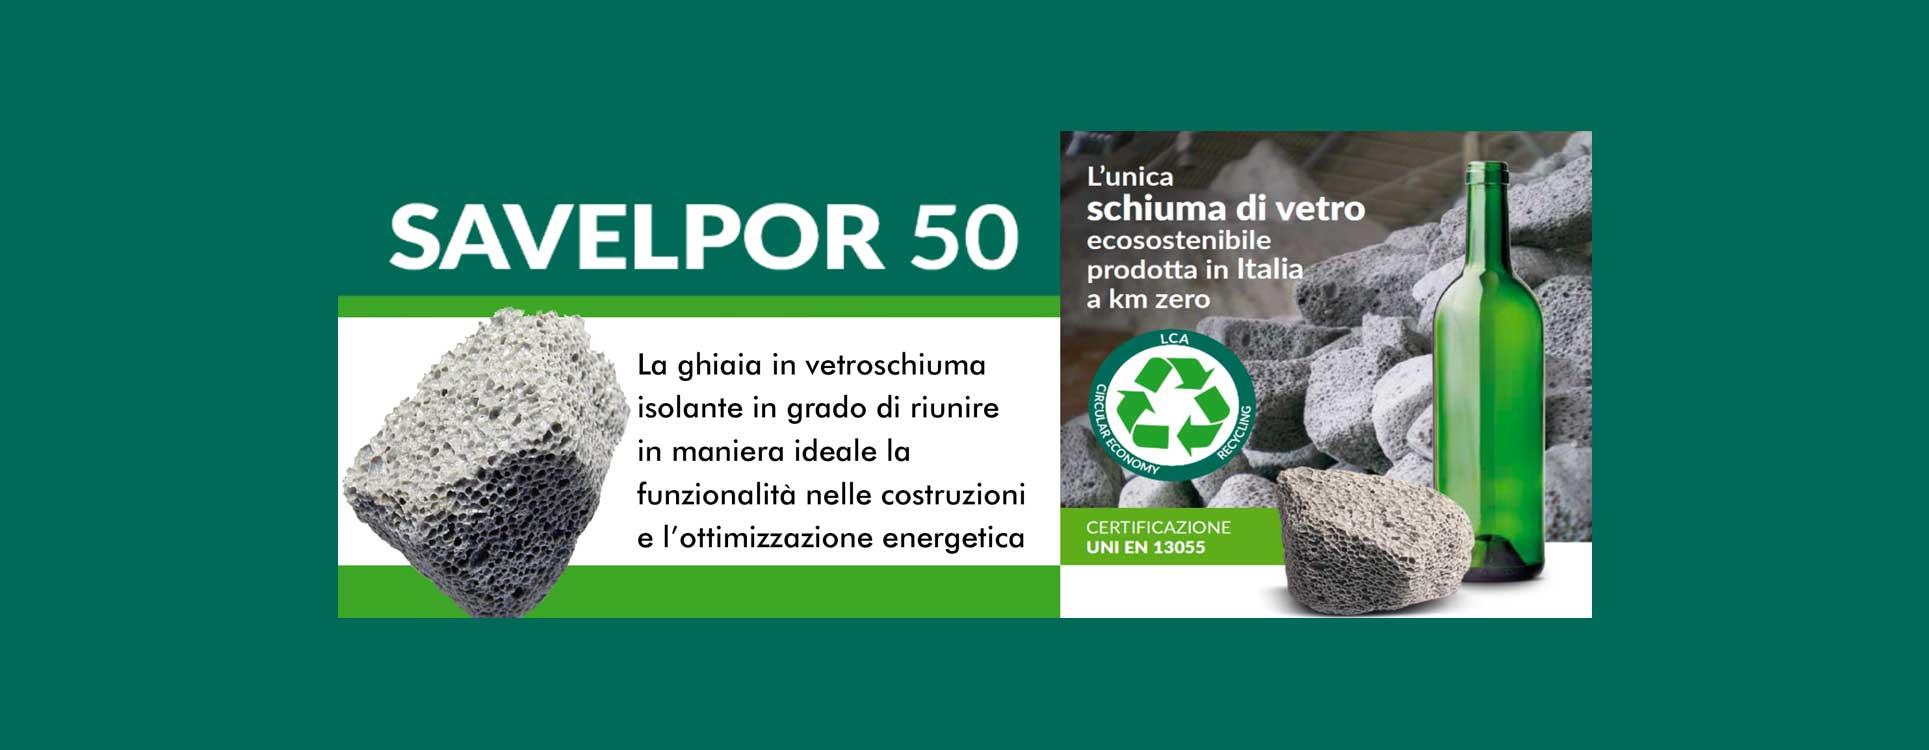 Savelpor50